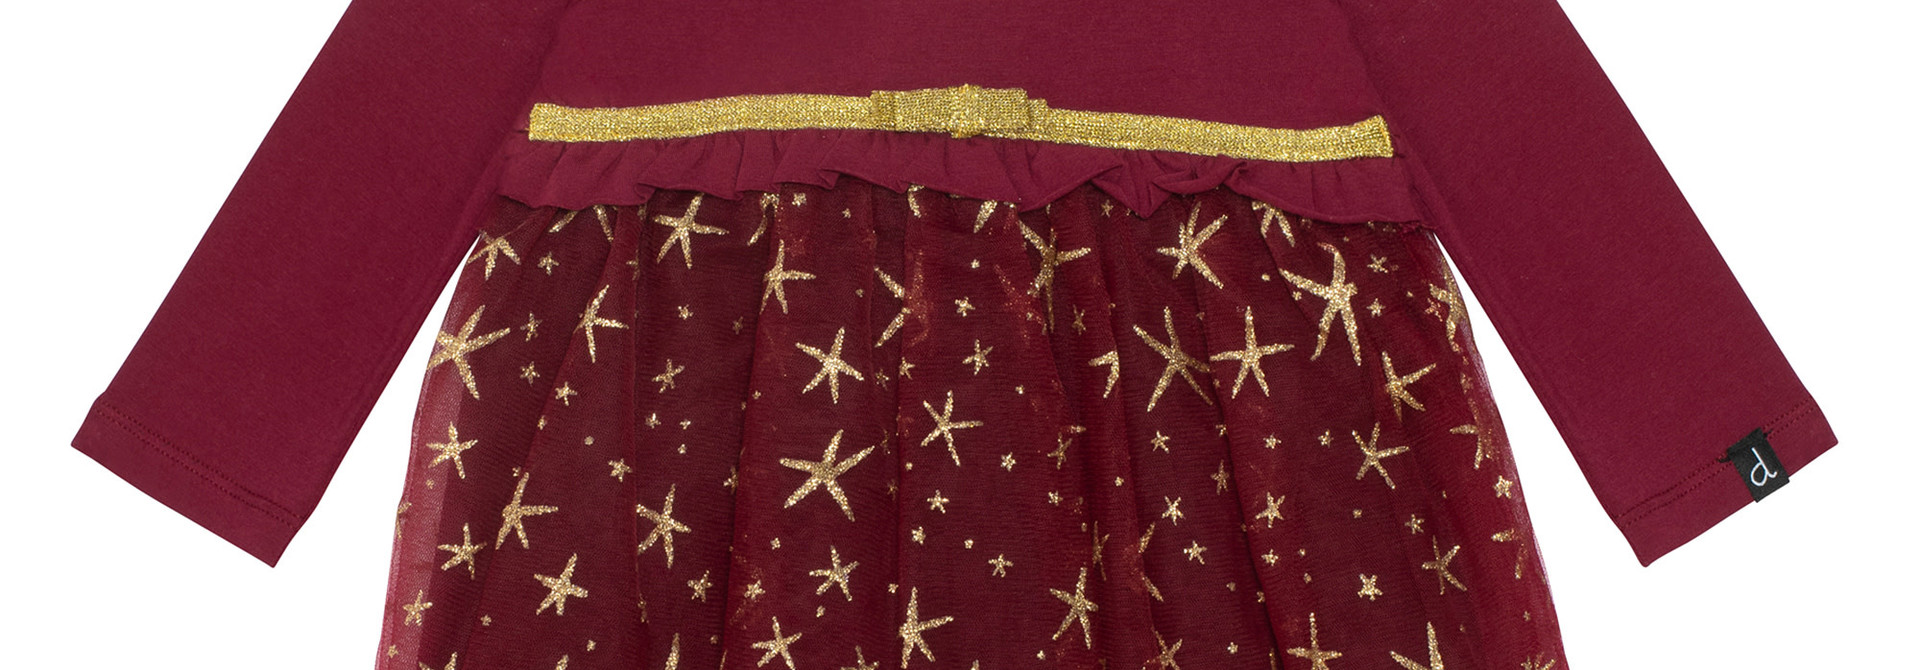 Robe Noël Étoile Rouge